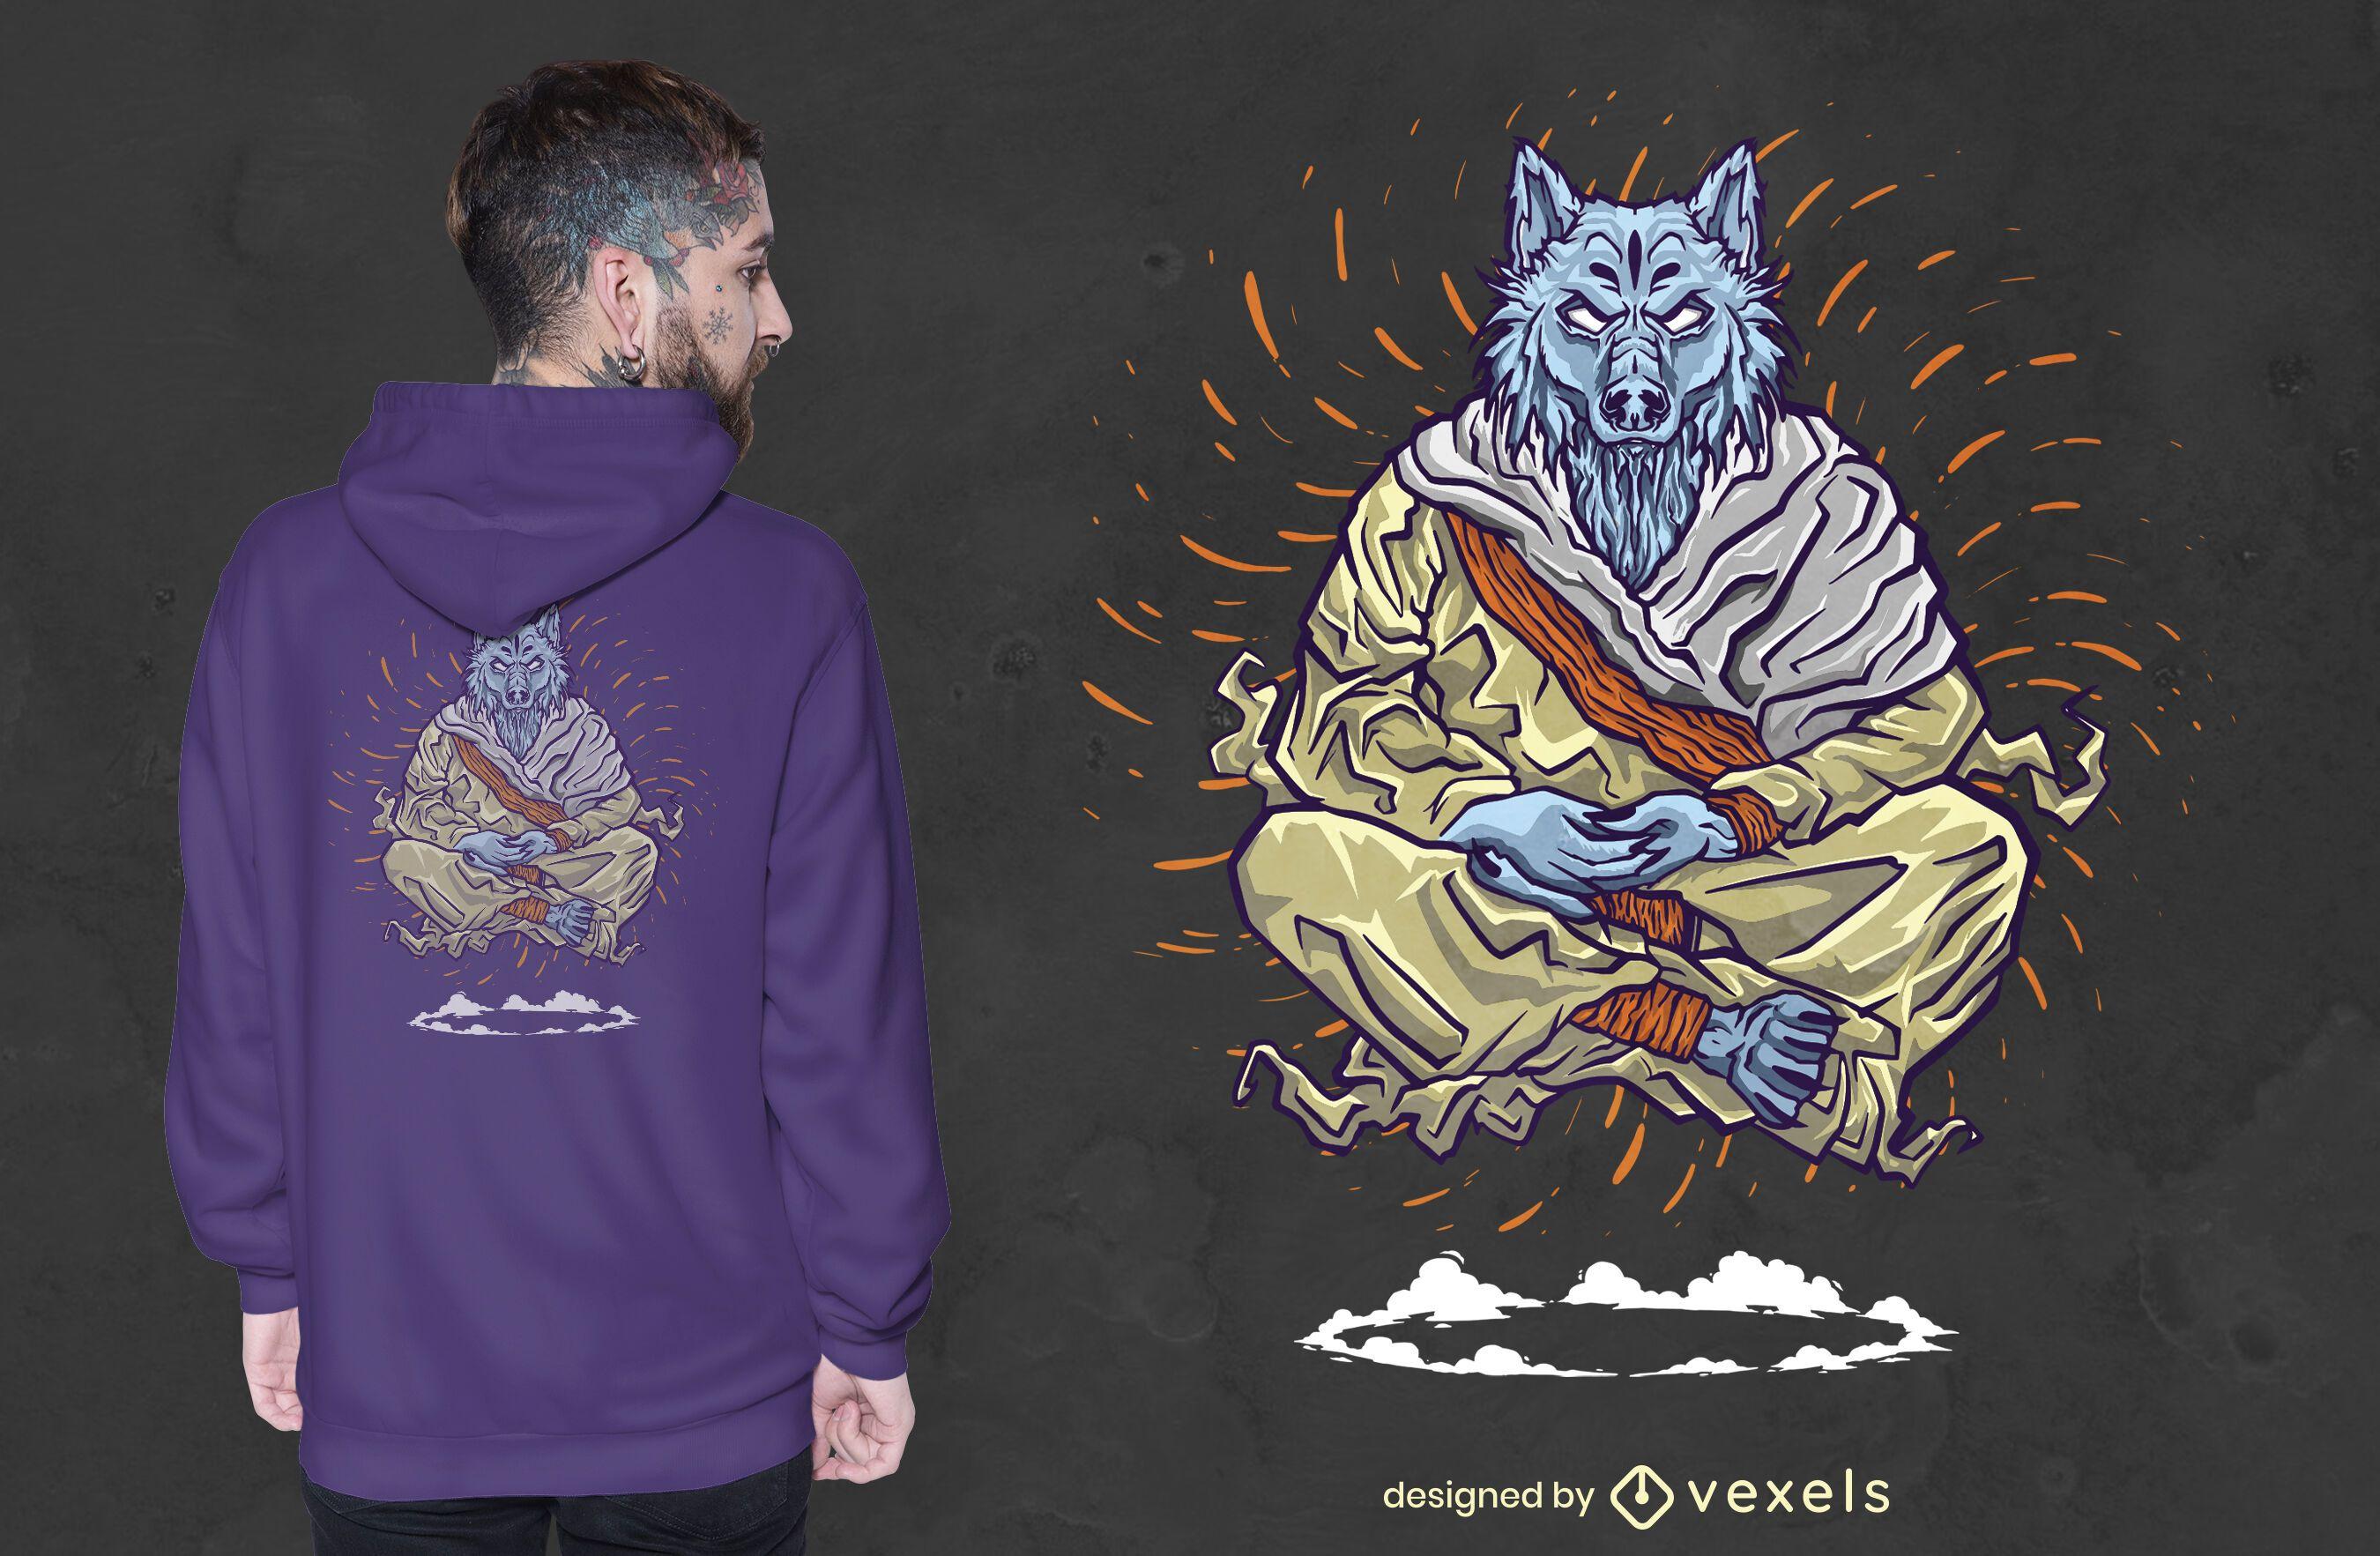 Diseño de camiseta de monje meditando.